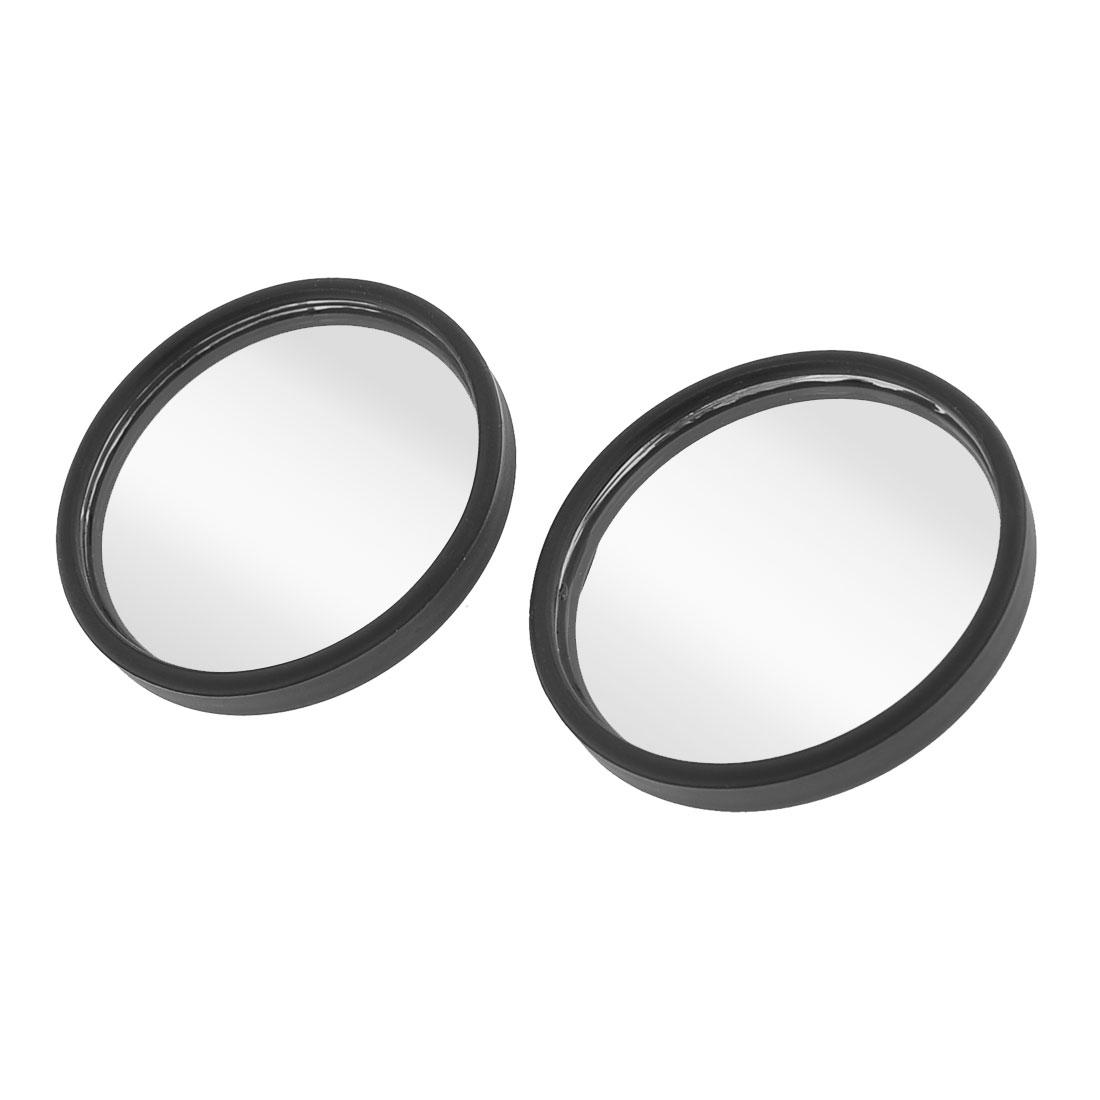 Unique Bargains Auto Car Adhesive Back Plastic Frame Blind Spot Mirror 50mm Dia x 2